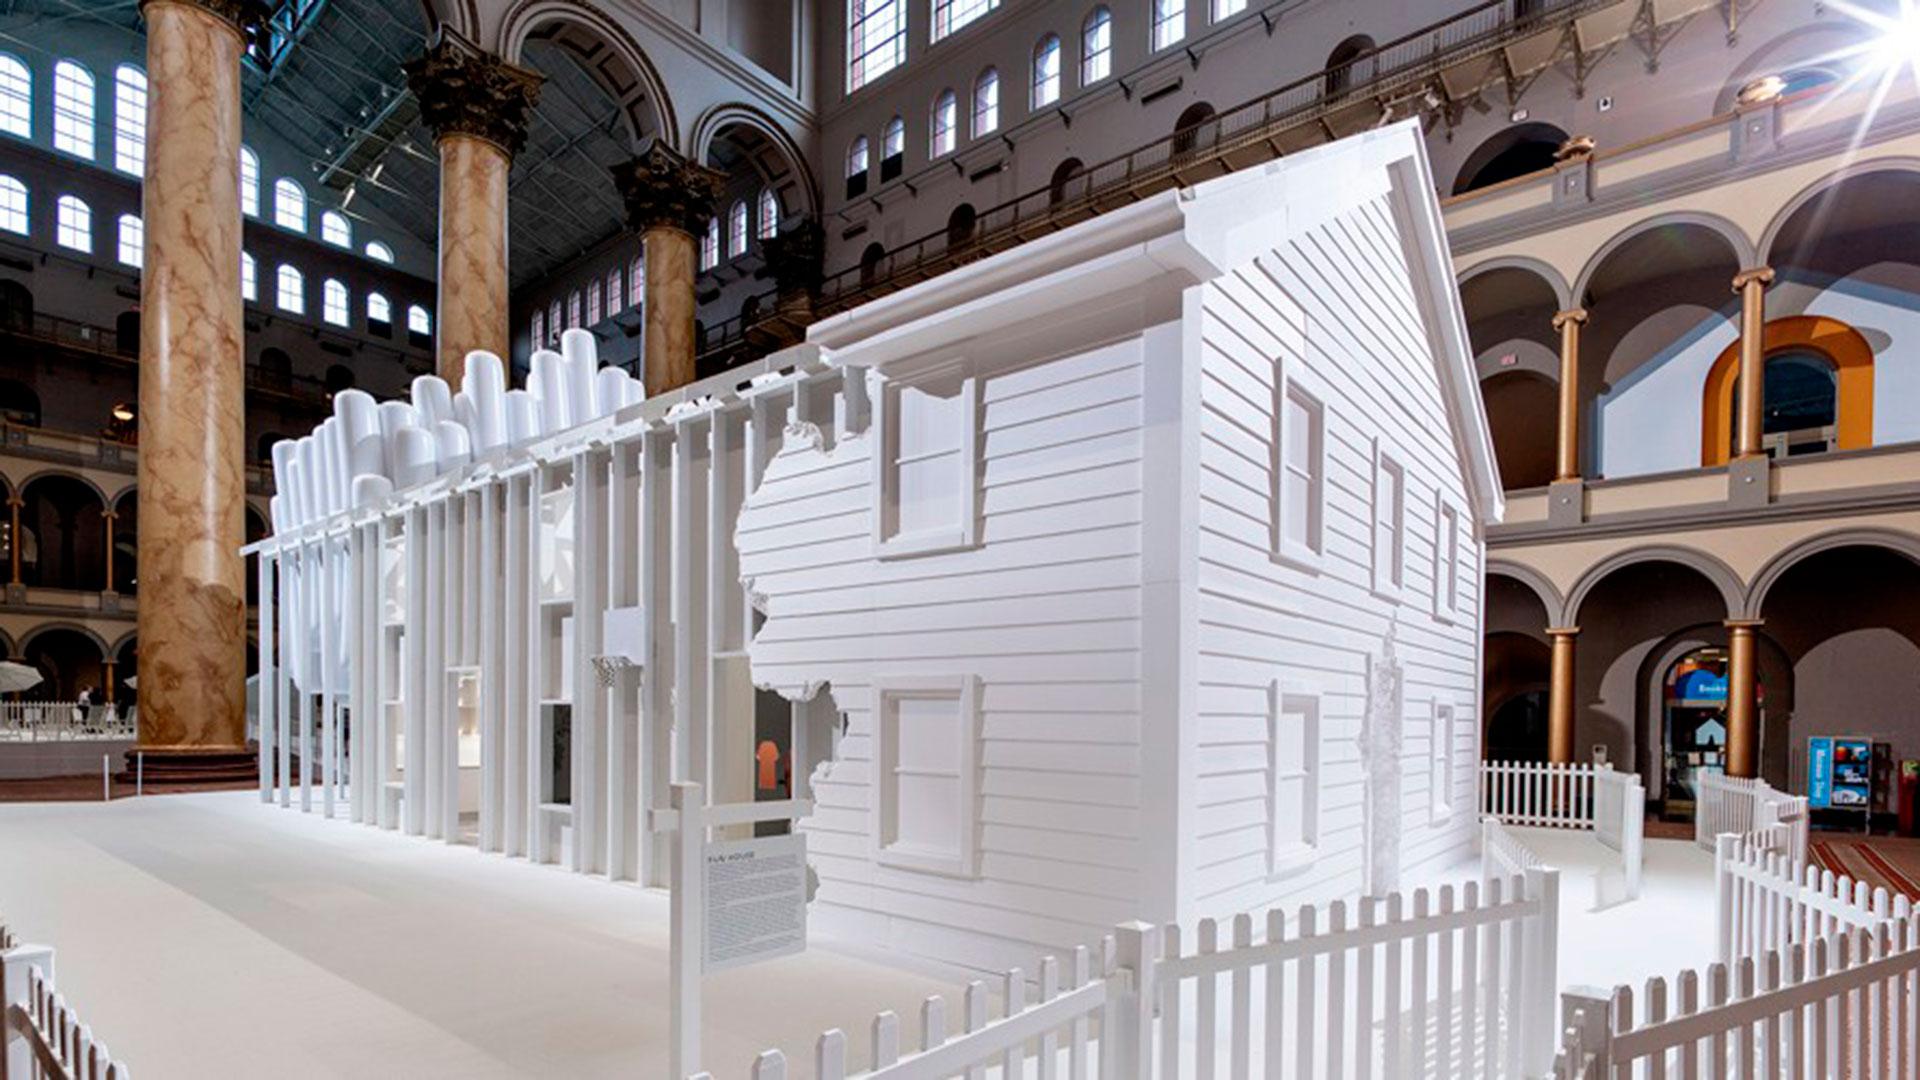 Fun House rinde homenaje a Snarkitecture en el National Building Museum